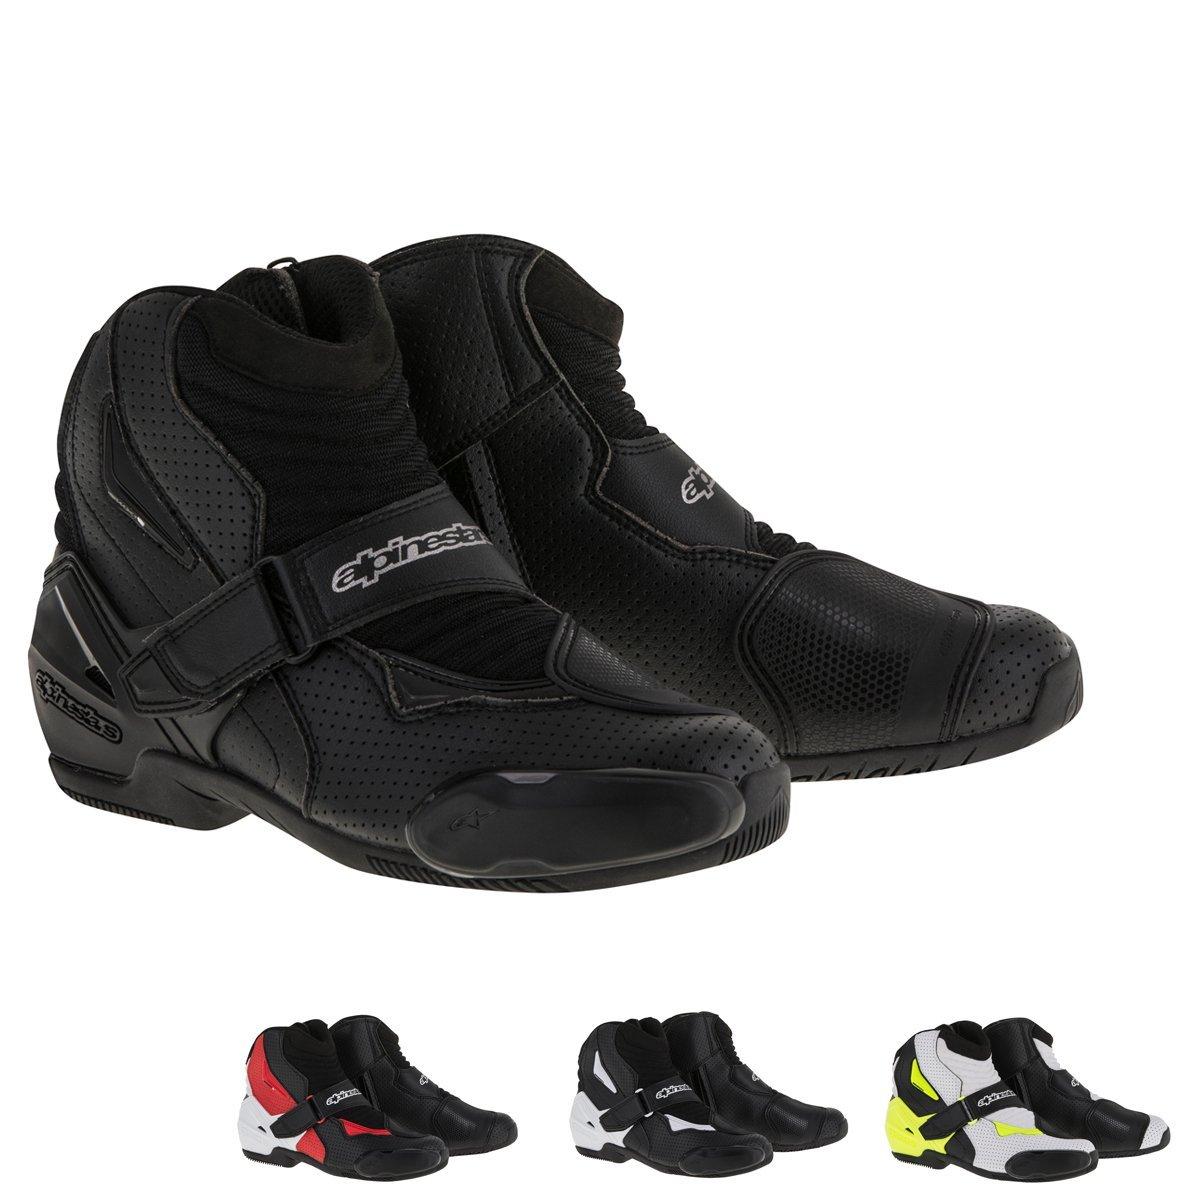 Alpinestars SMX-1R Vented Men's Street Motorcycle Shoes - Black/White / 44